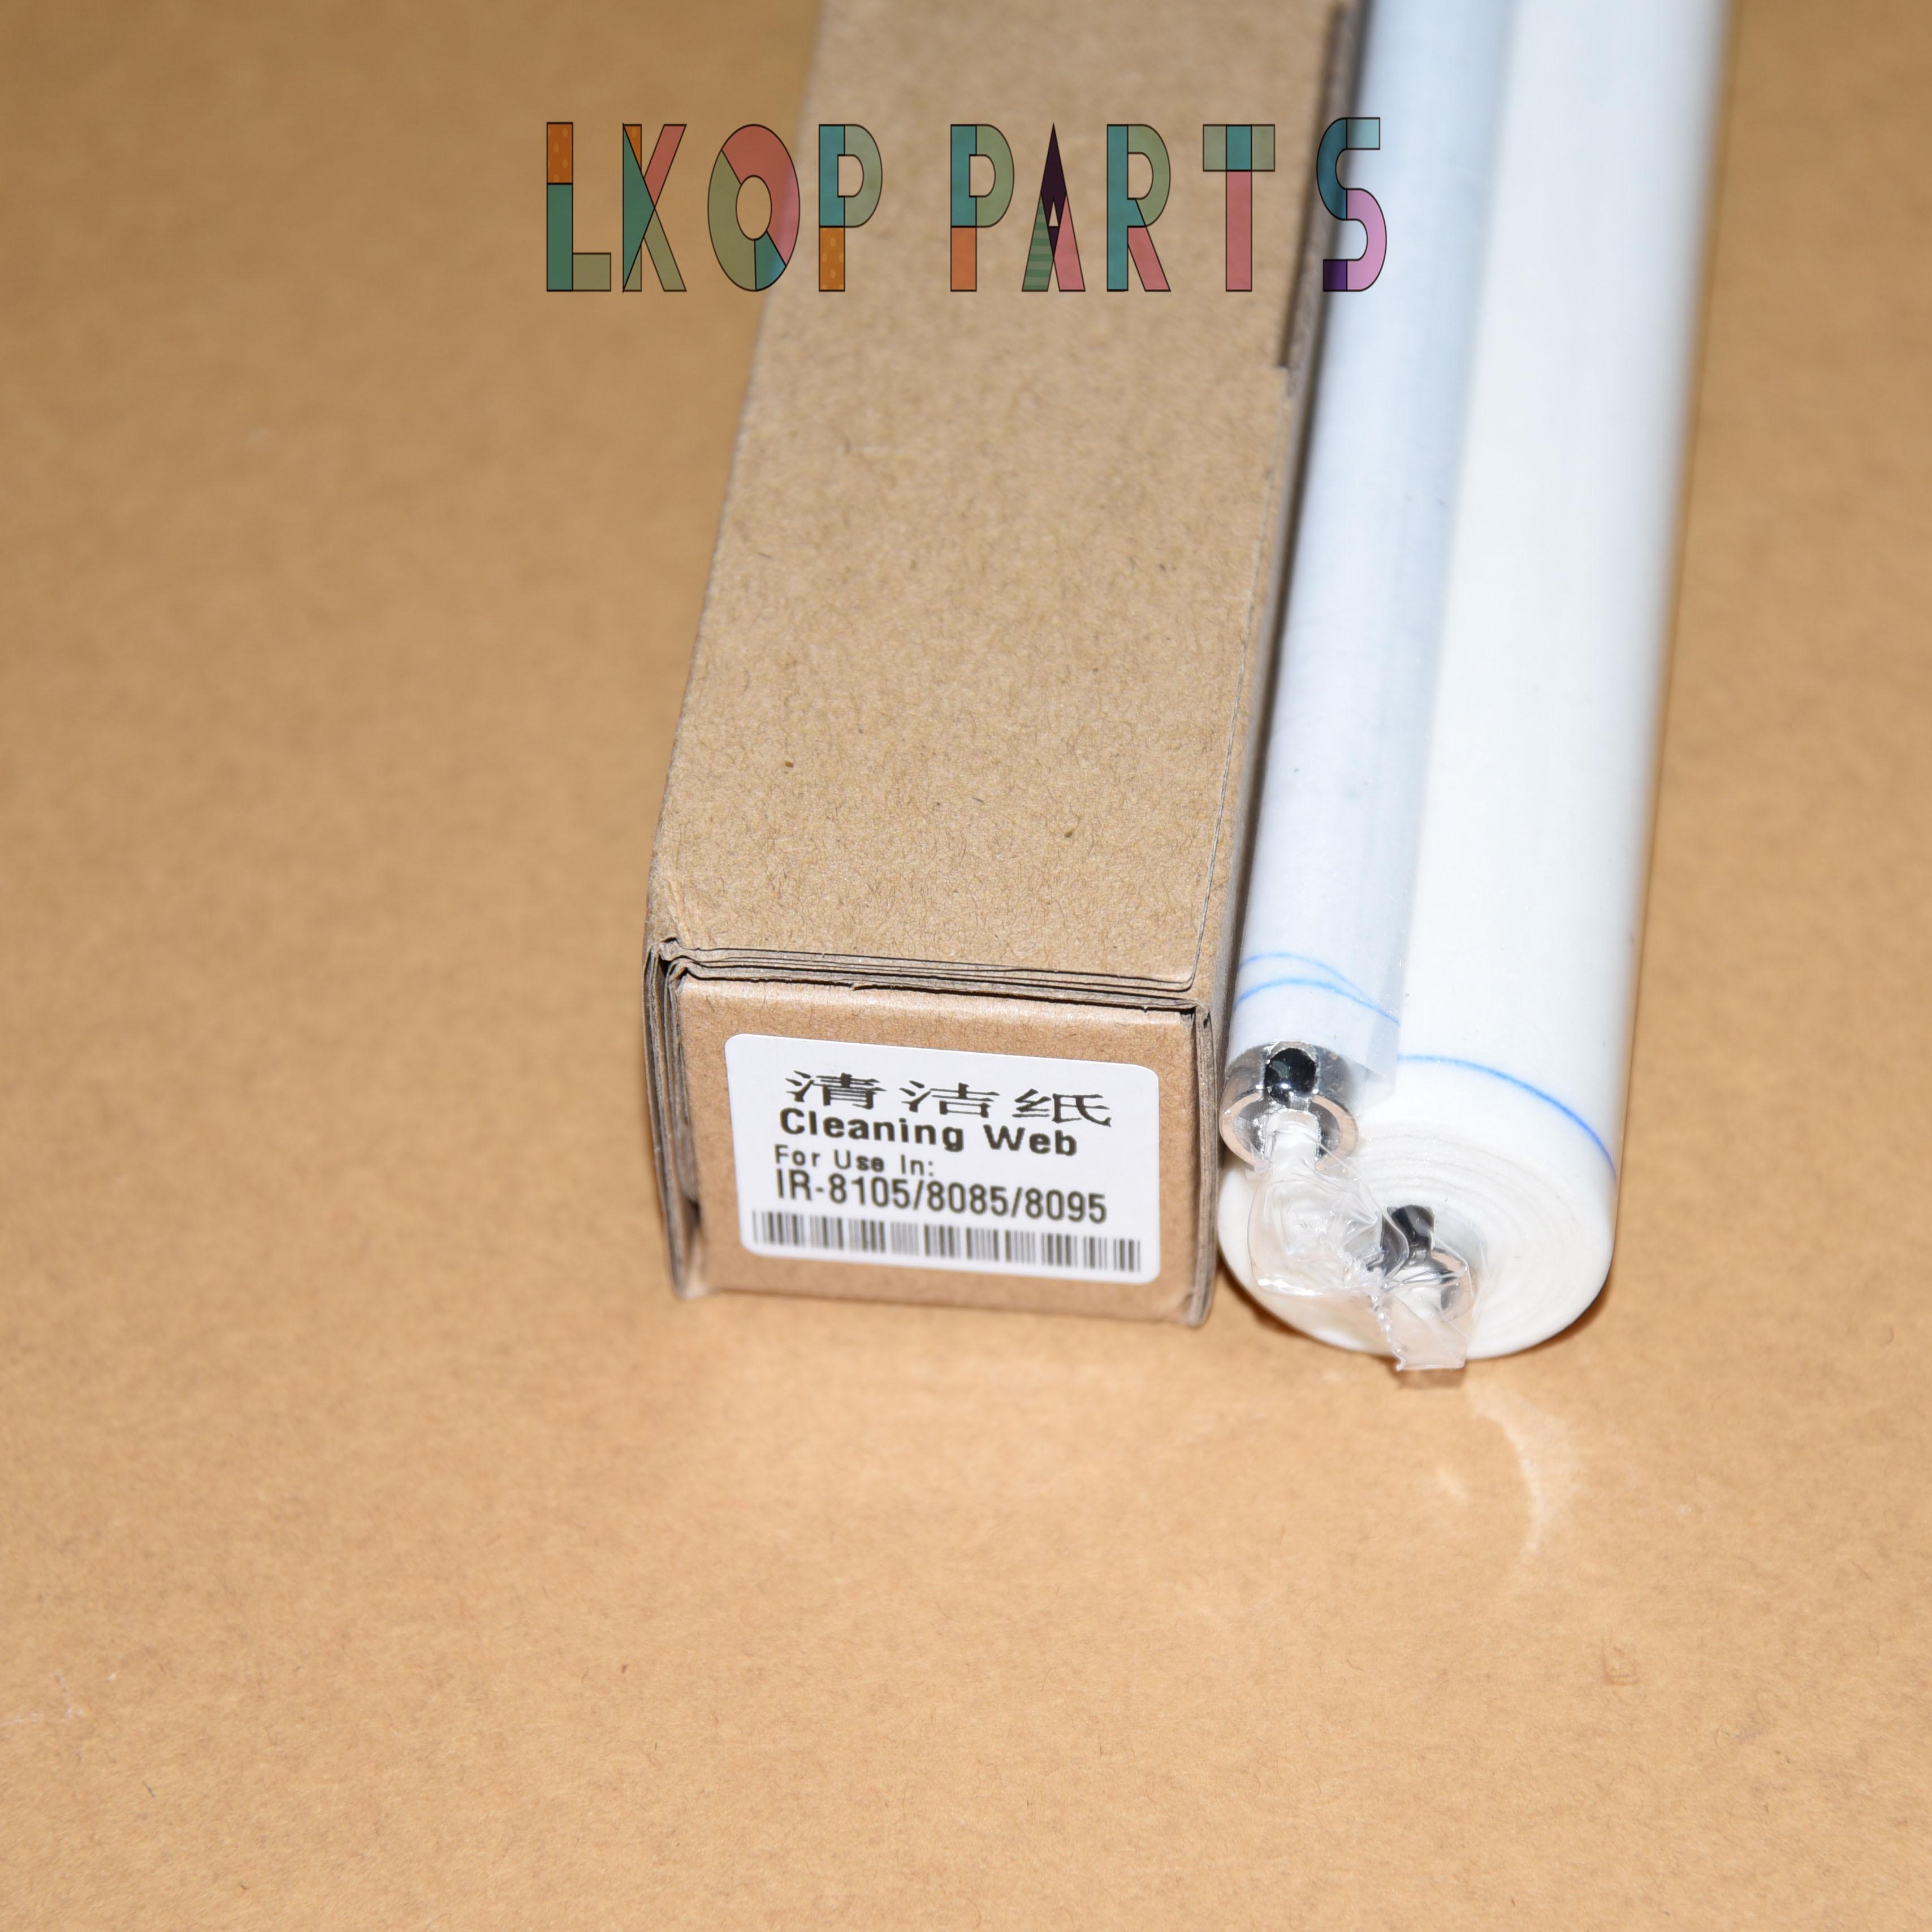 Web para Canon Limpeza Rolo Fusor Ir8095 Ir8105 Ir8205 Fc52286-000 Ir8285 ir Advance 8085 8095 8105 8205 8285 8295 2pcs Ir8085